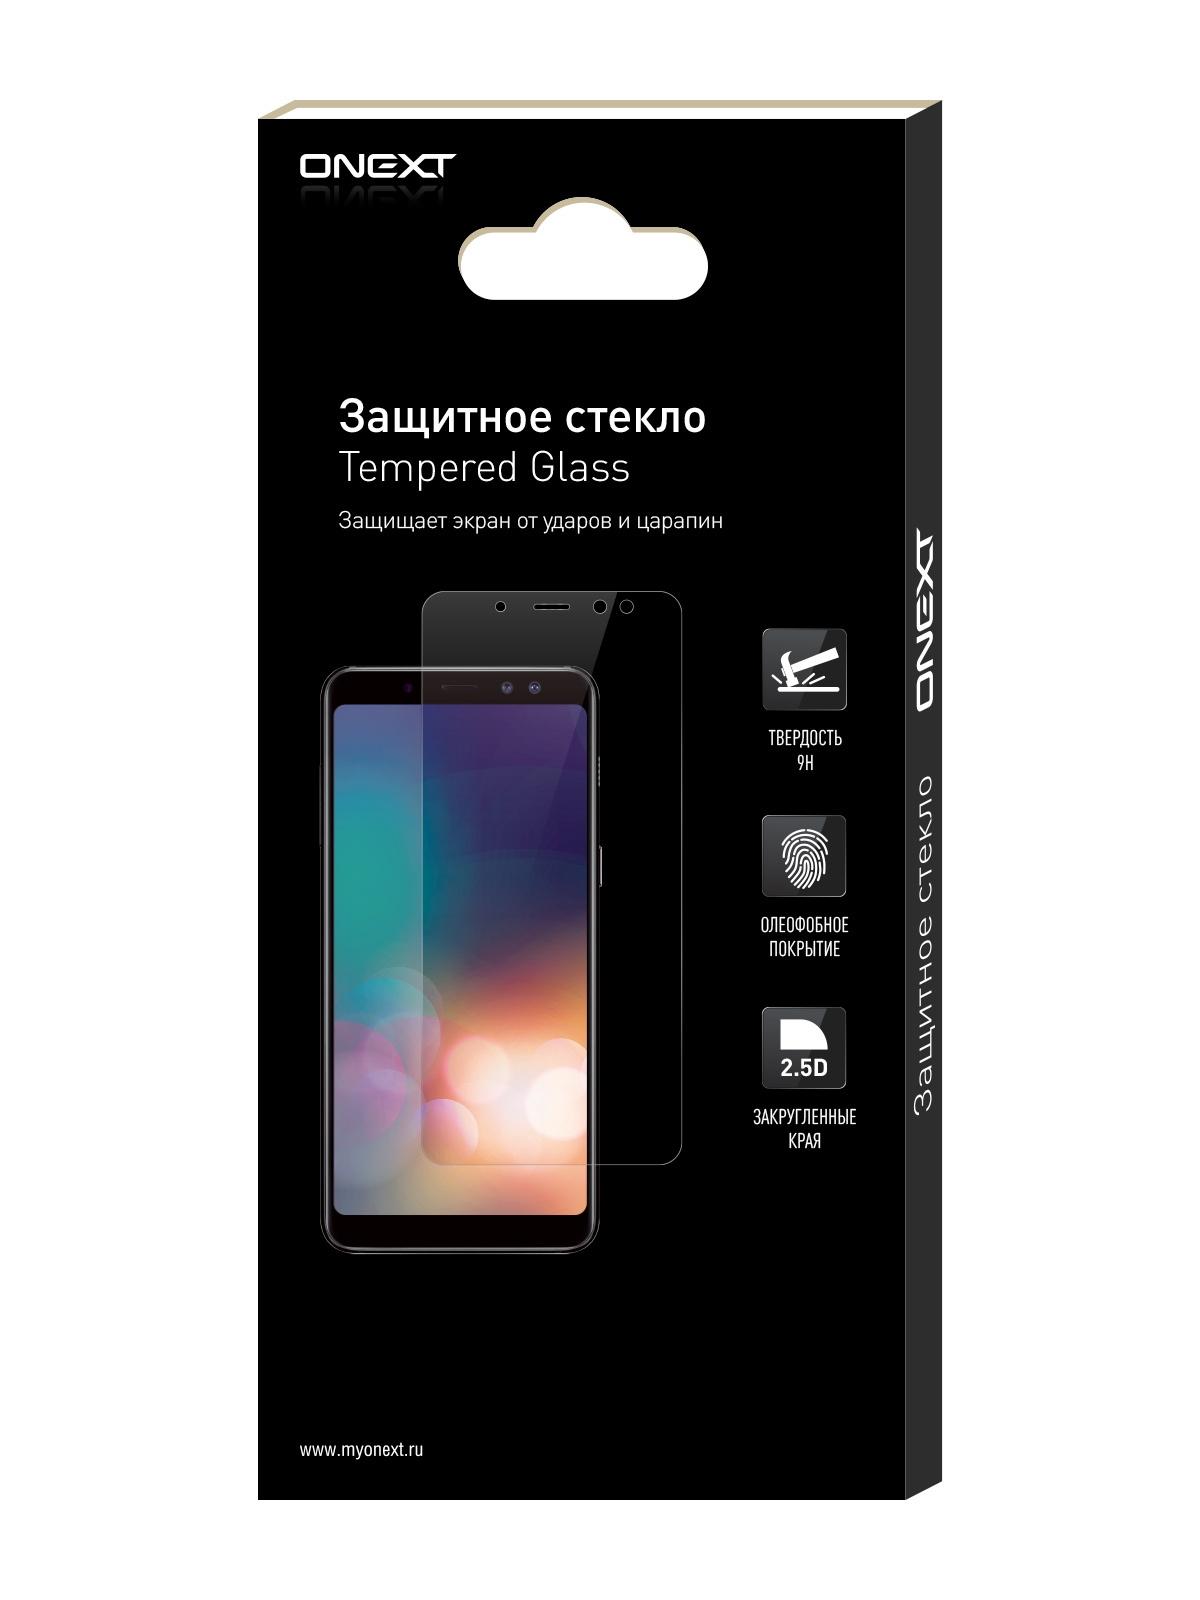 Защитное стекло ONEXT Huawei P8 Lite защитное стекло onext для huawei p10 lite 641 41432 с рамкой белый